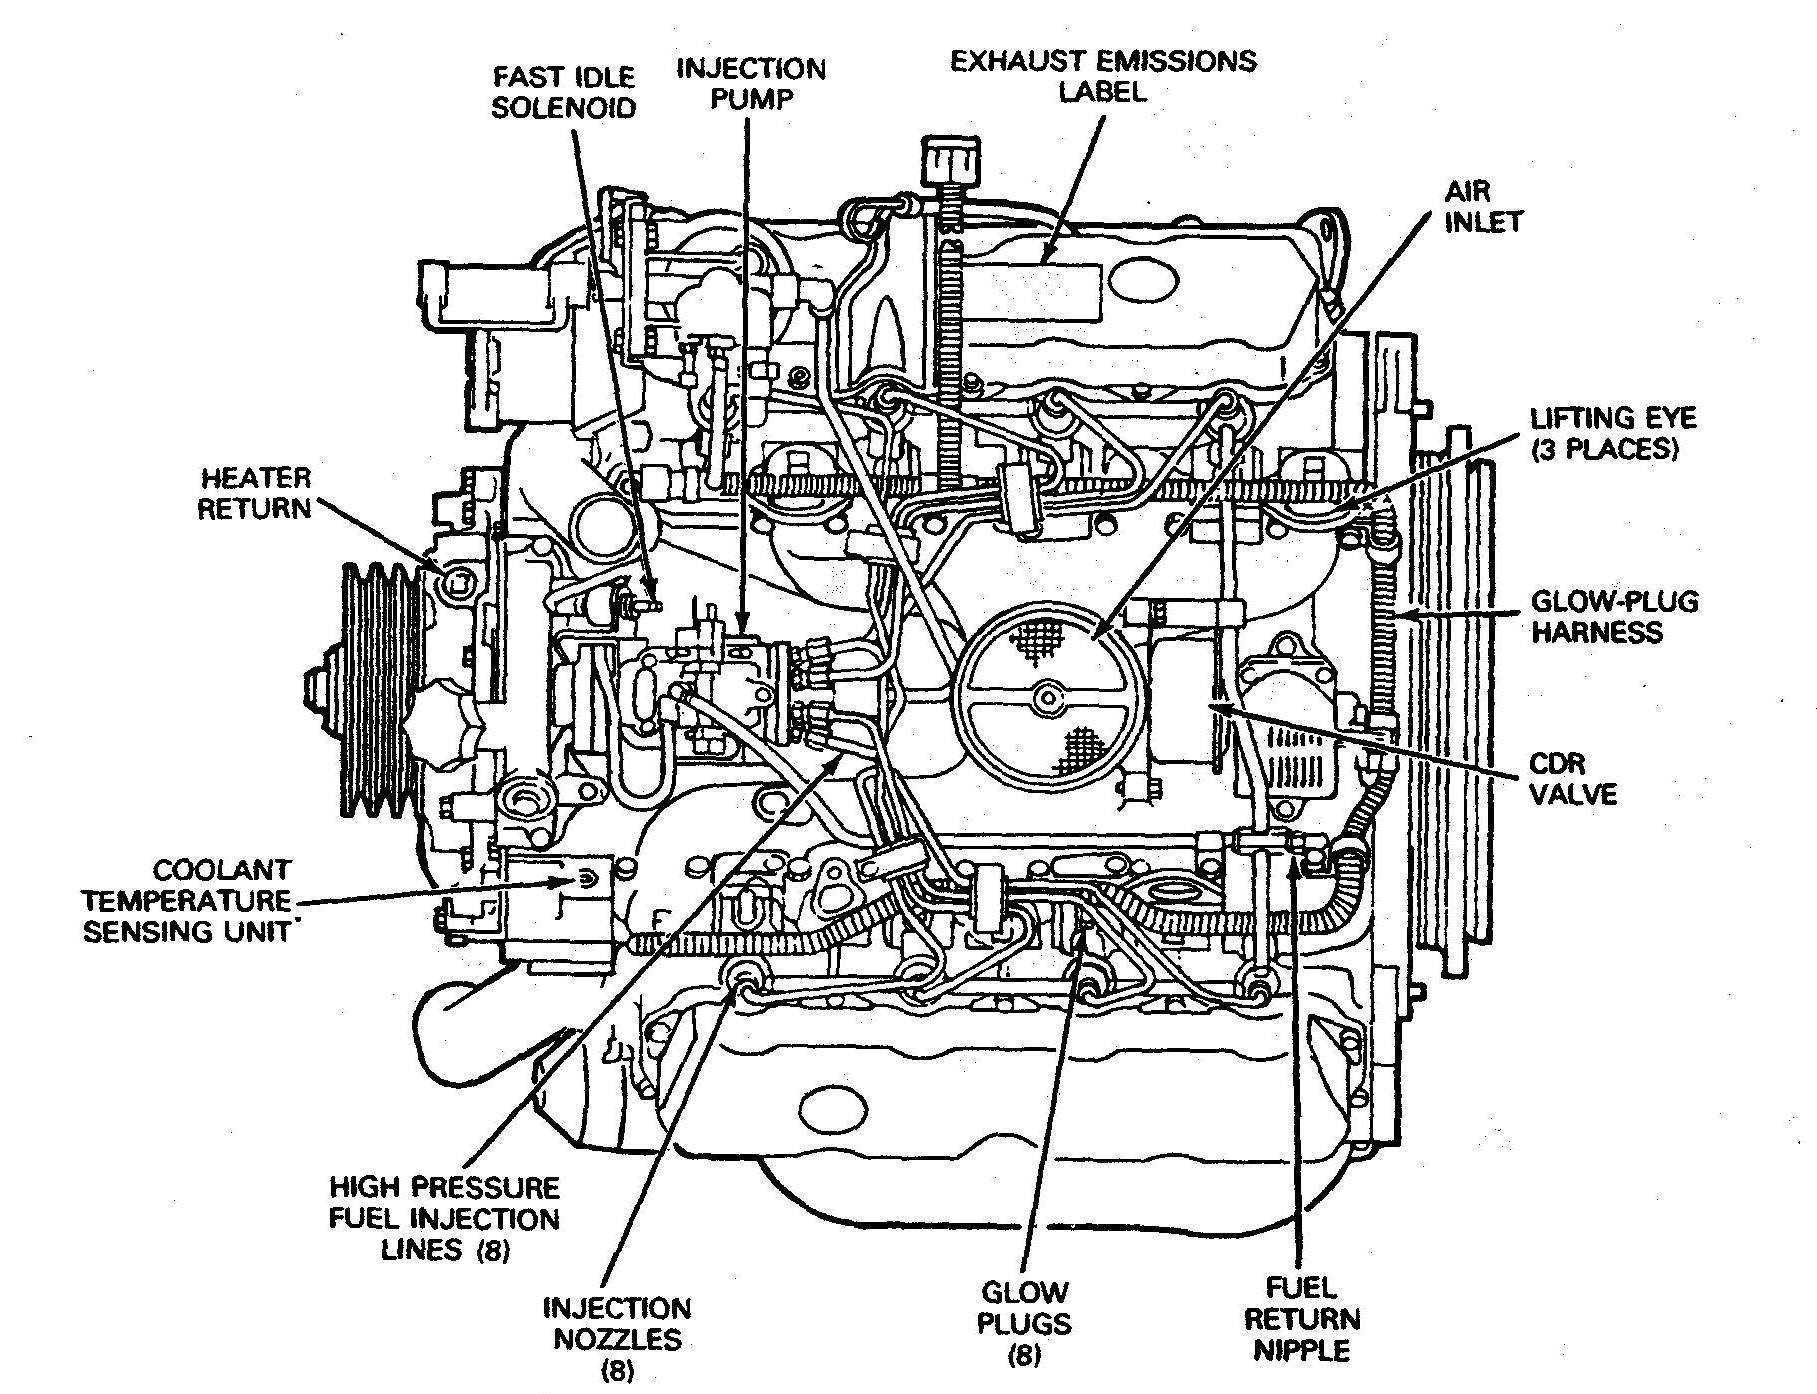 Diagram Of Car Parts M4 Carbine Schematic Military Pinterest My Auto Wiring Automotive Engine Diagrams